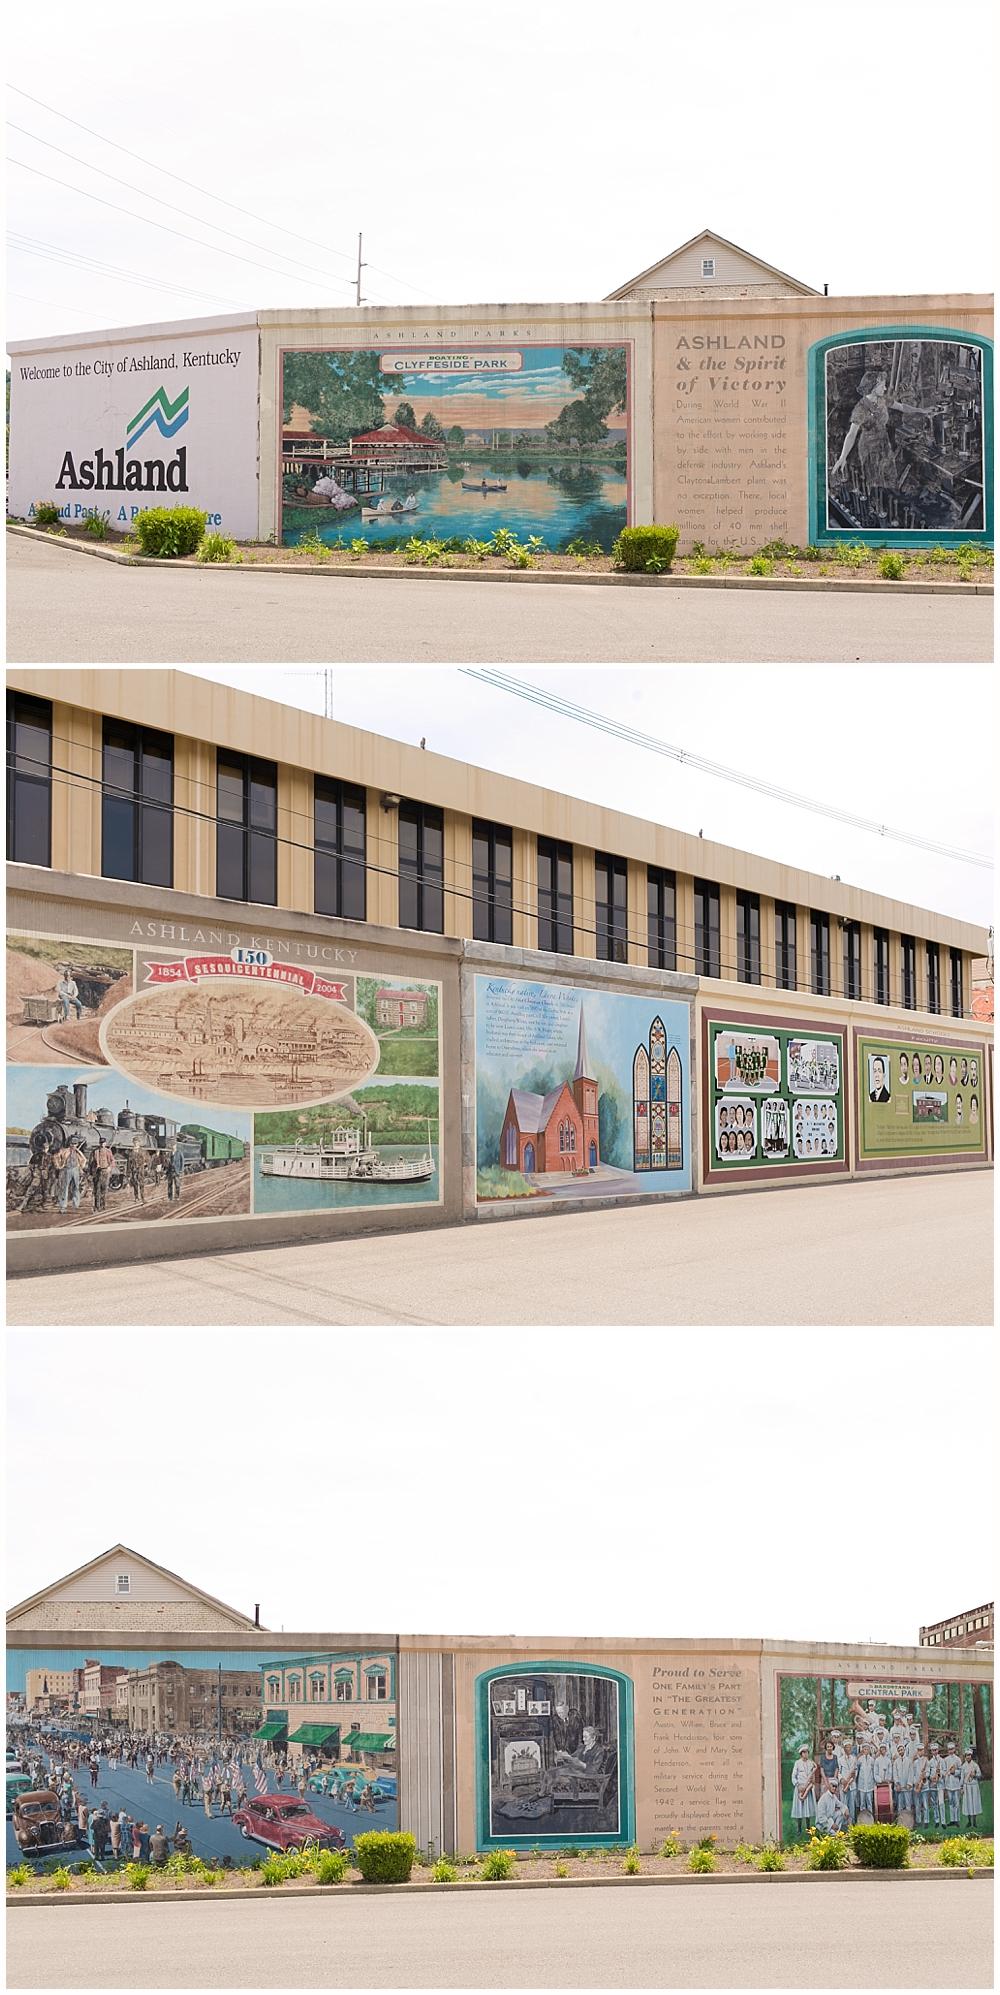 murals on flood wall in Ashland, Kentucky